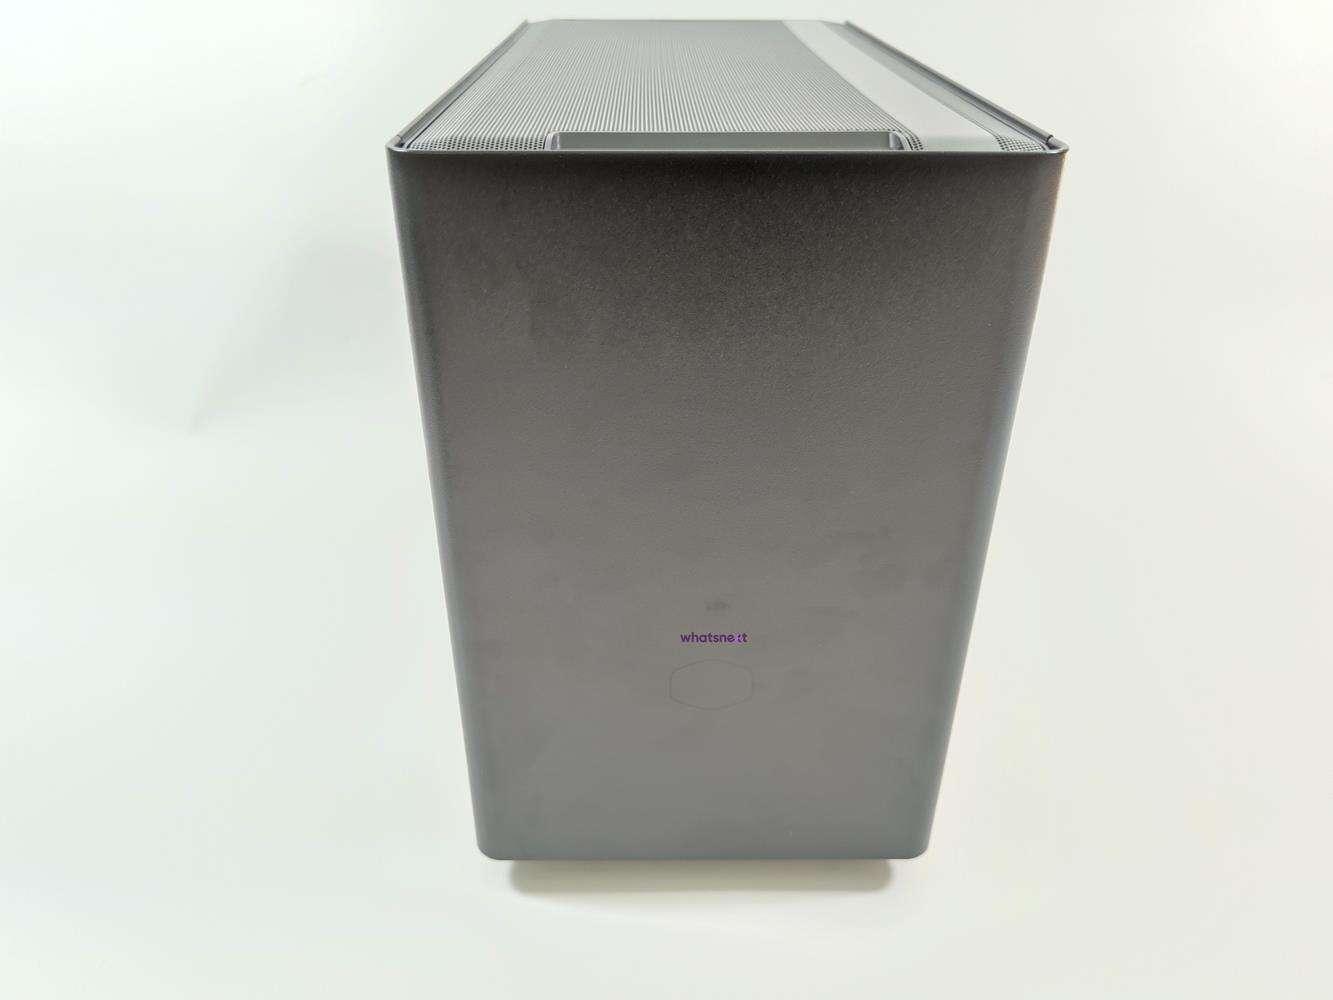 test Cooler Master MasterBox NR200, recnezja Cooler Master MasterBox NR200, opinia Cooler Master MasterBox NR200